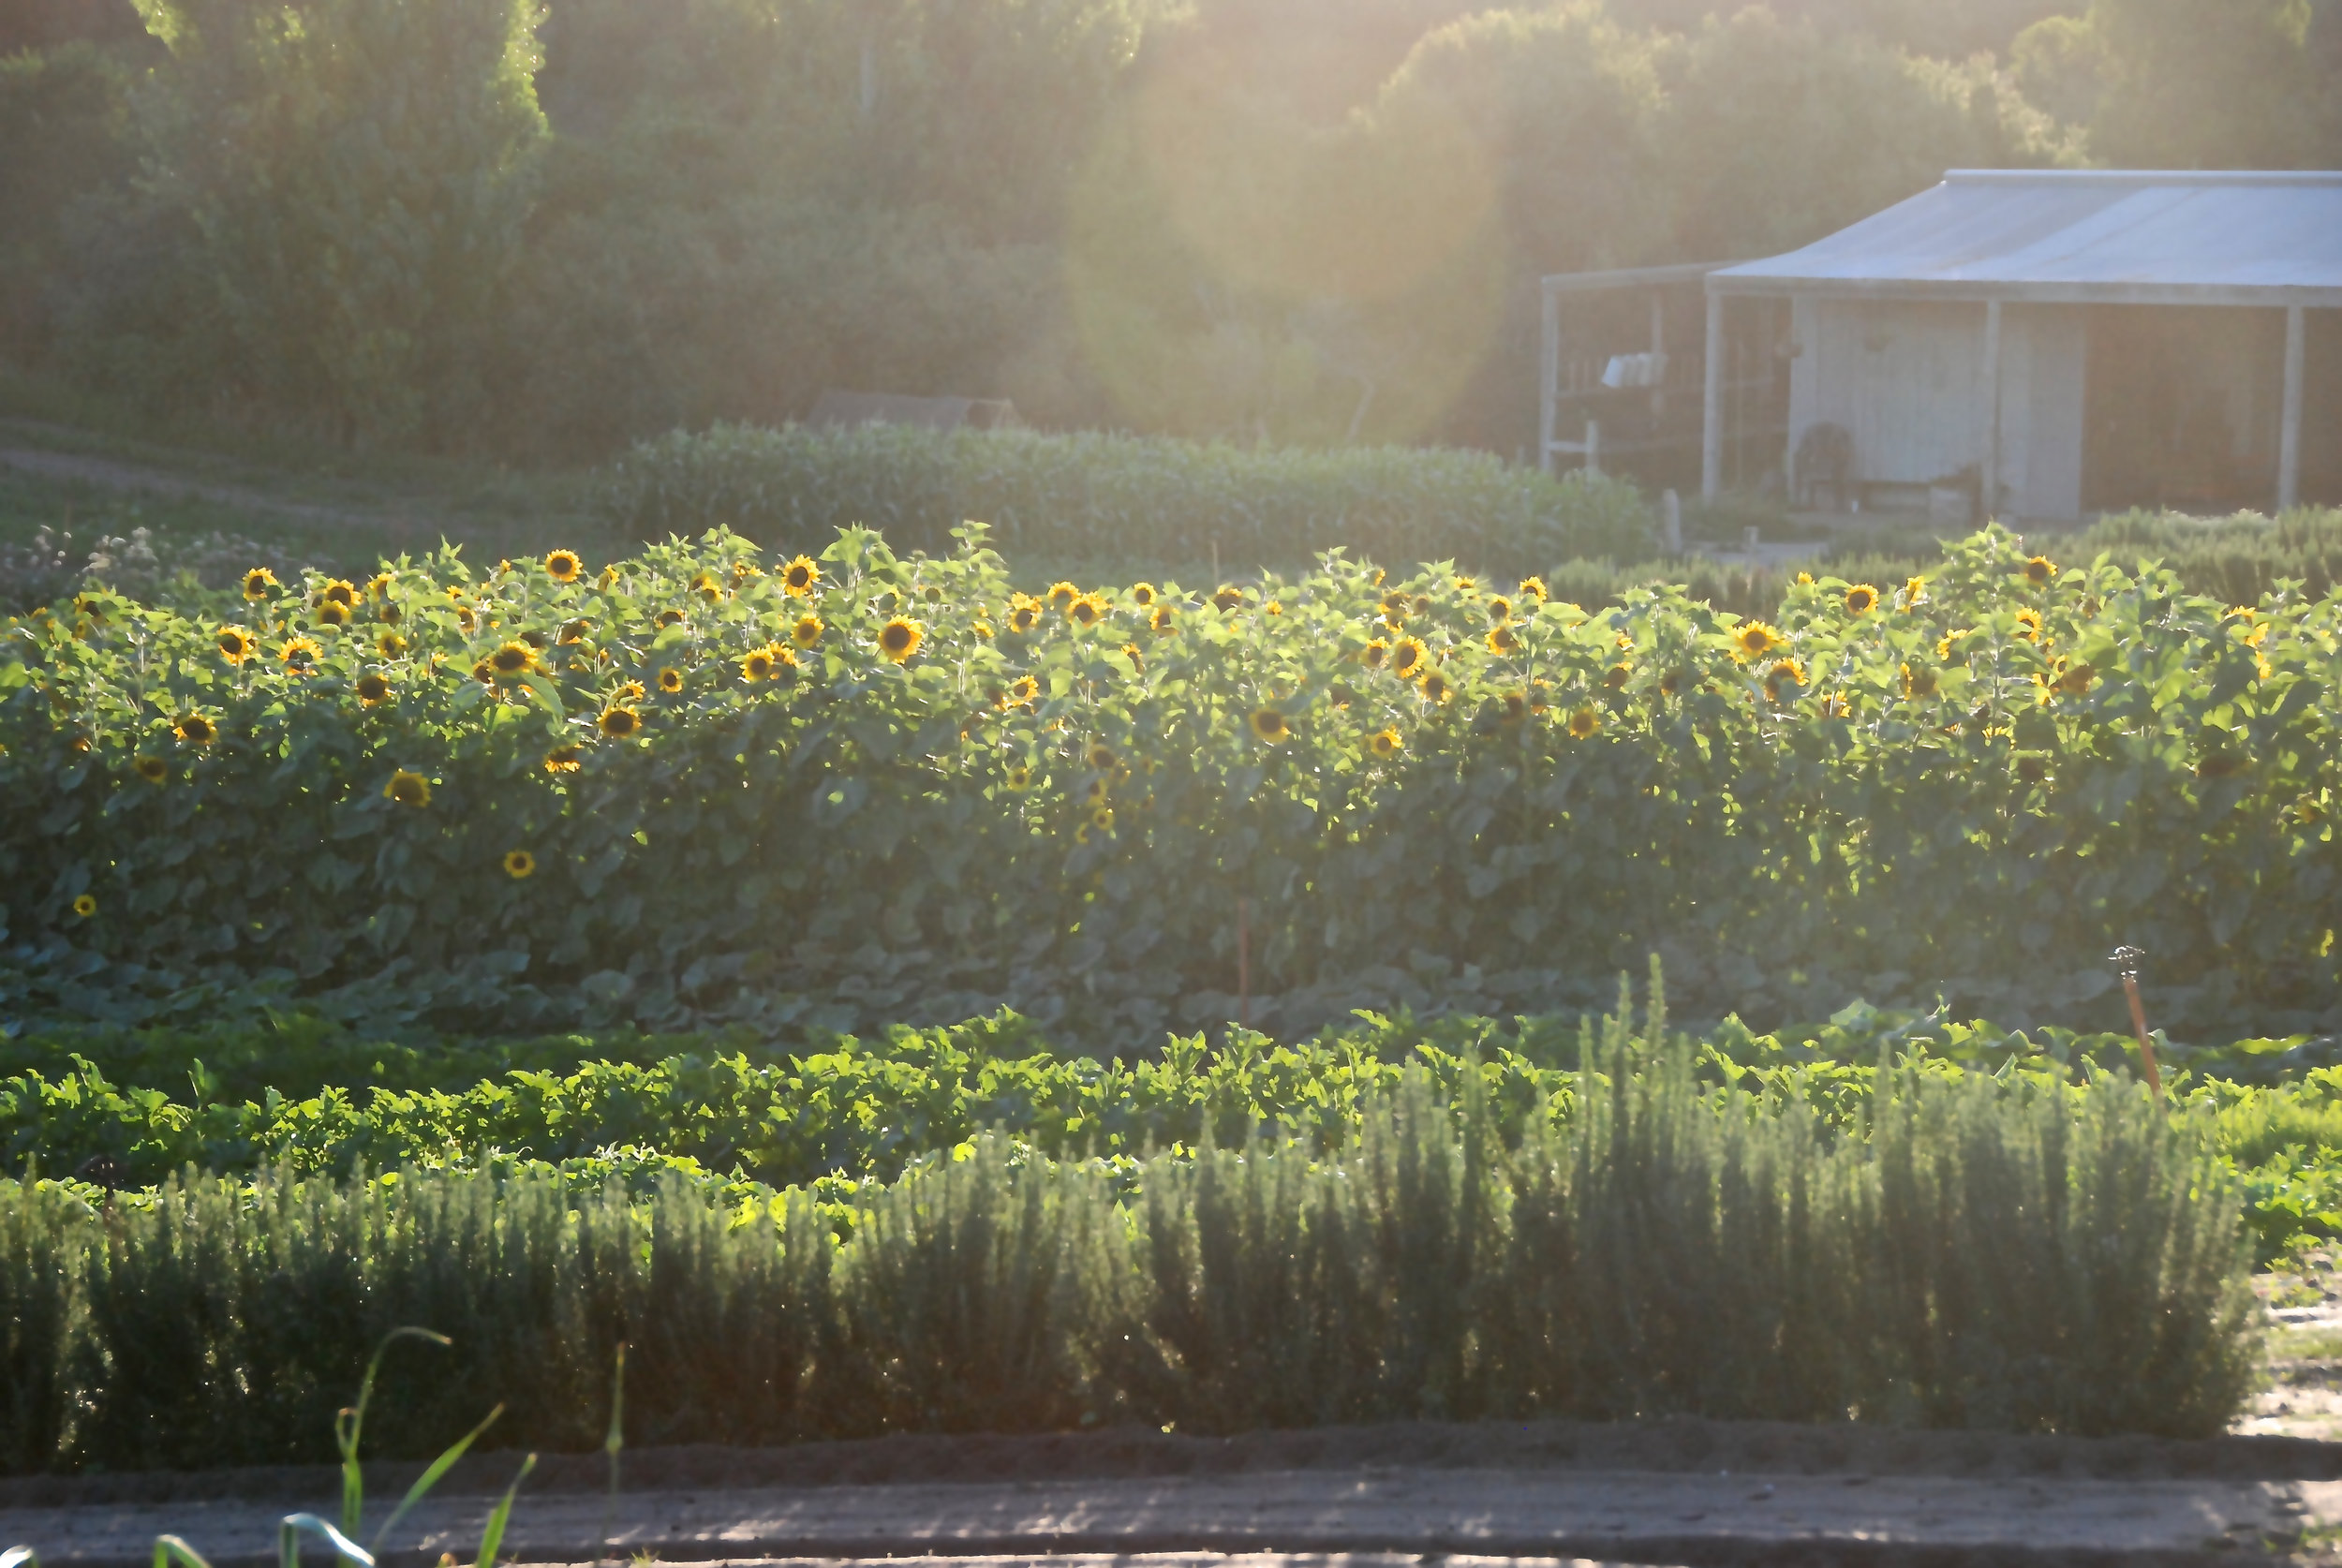 sunflowers, pumpkins, squash, rosemary - FEBRUARY 2018